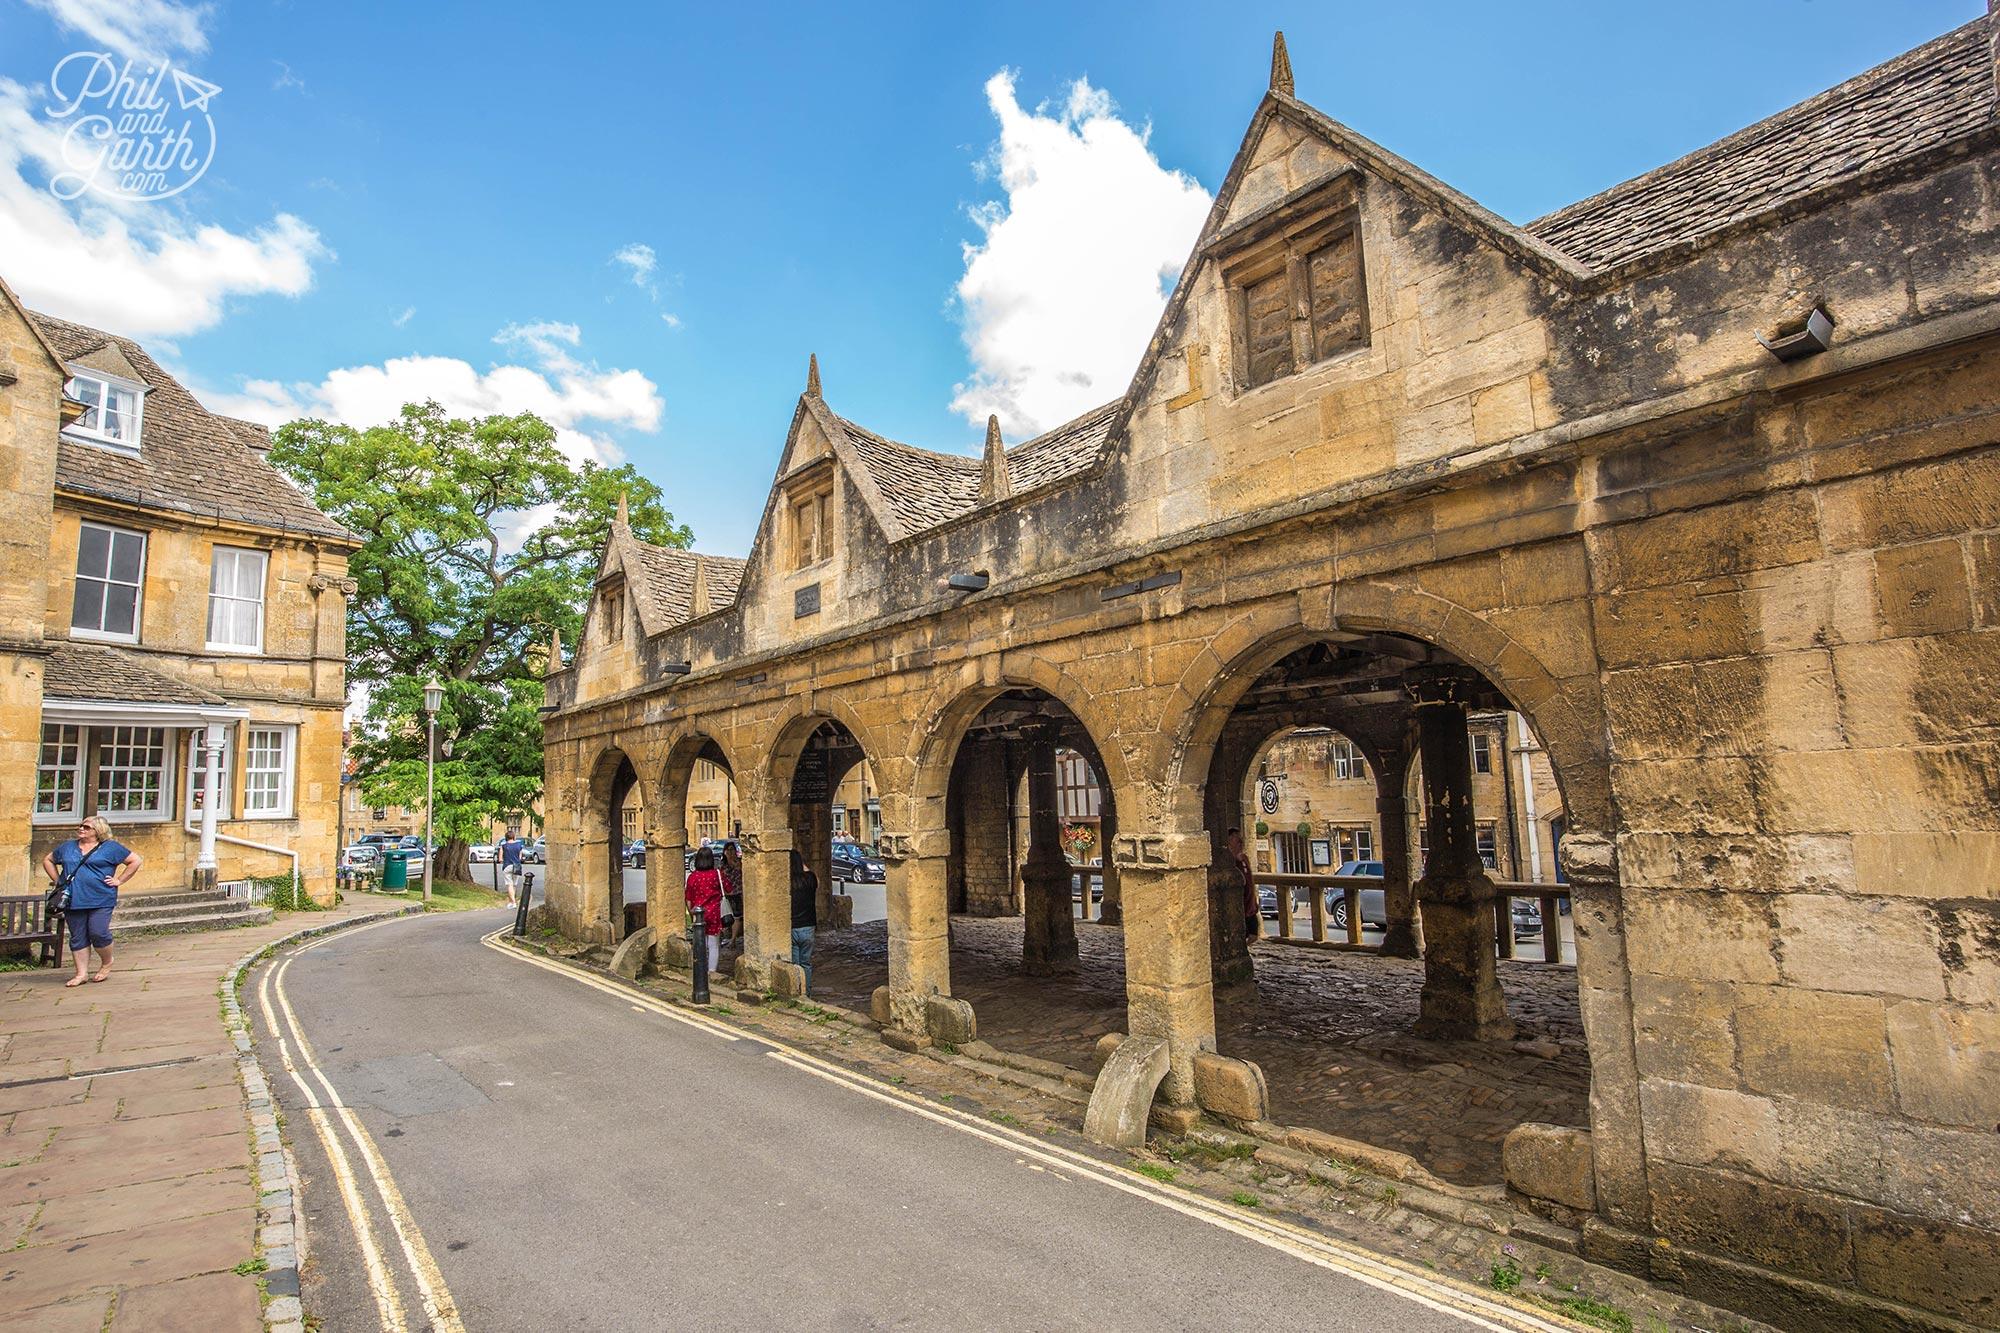 Chipping Campden's historic market hall